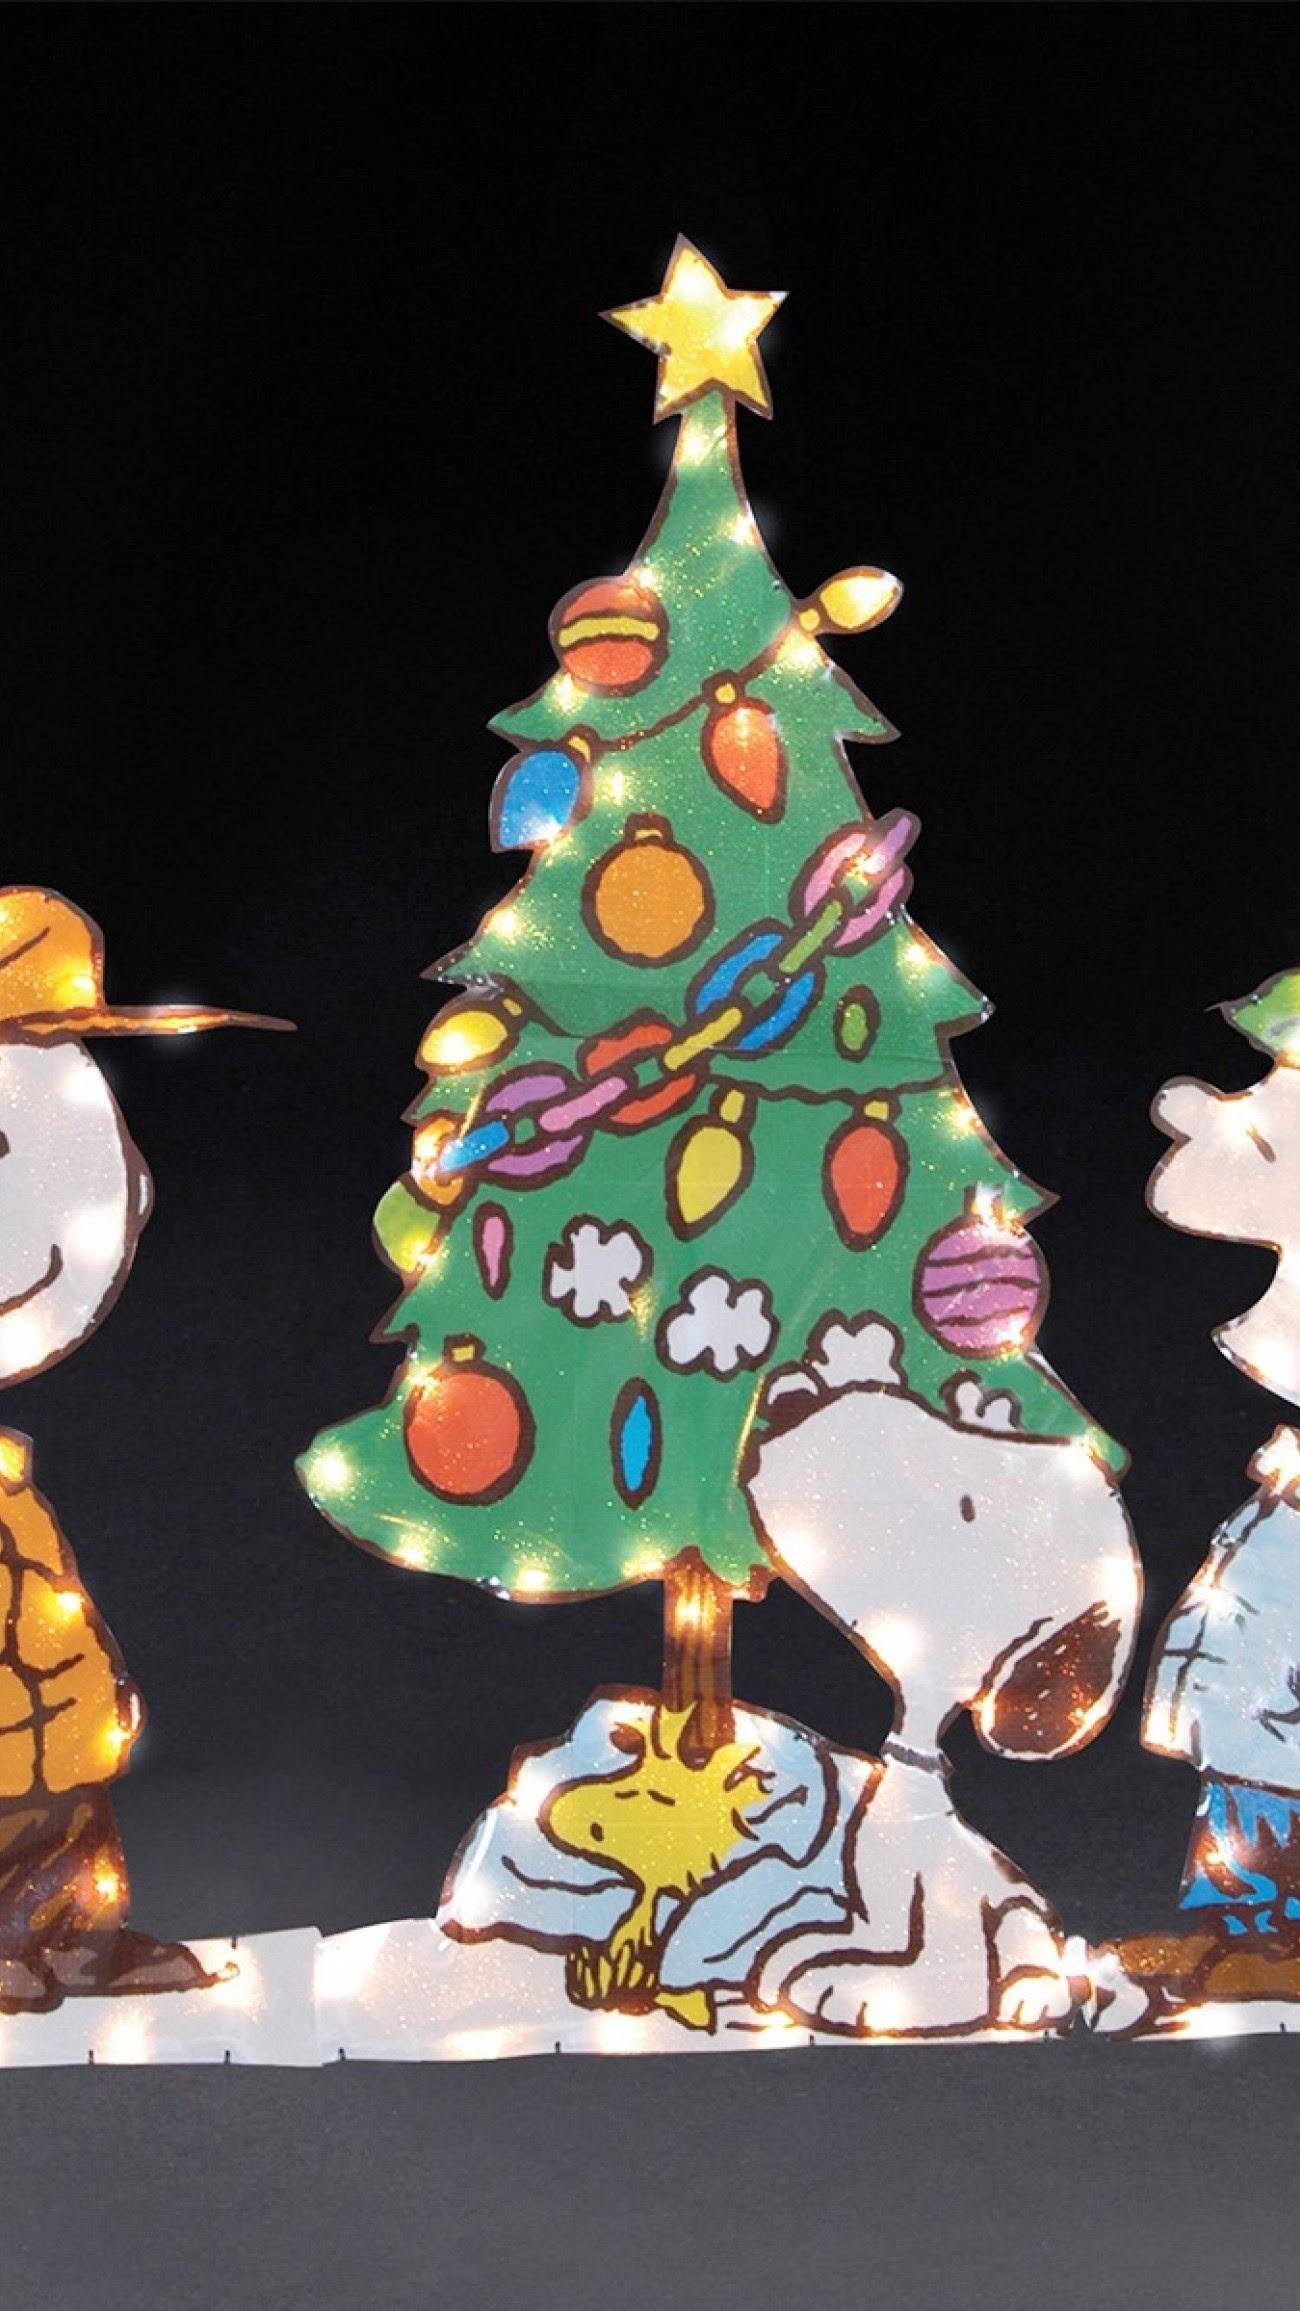 Peanuts Christmas Wallpaper 35 Images